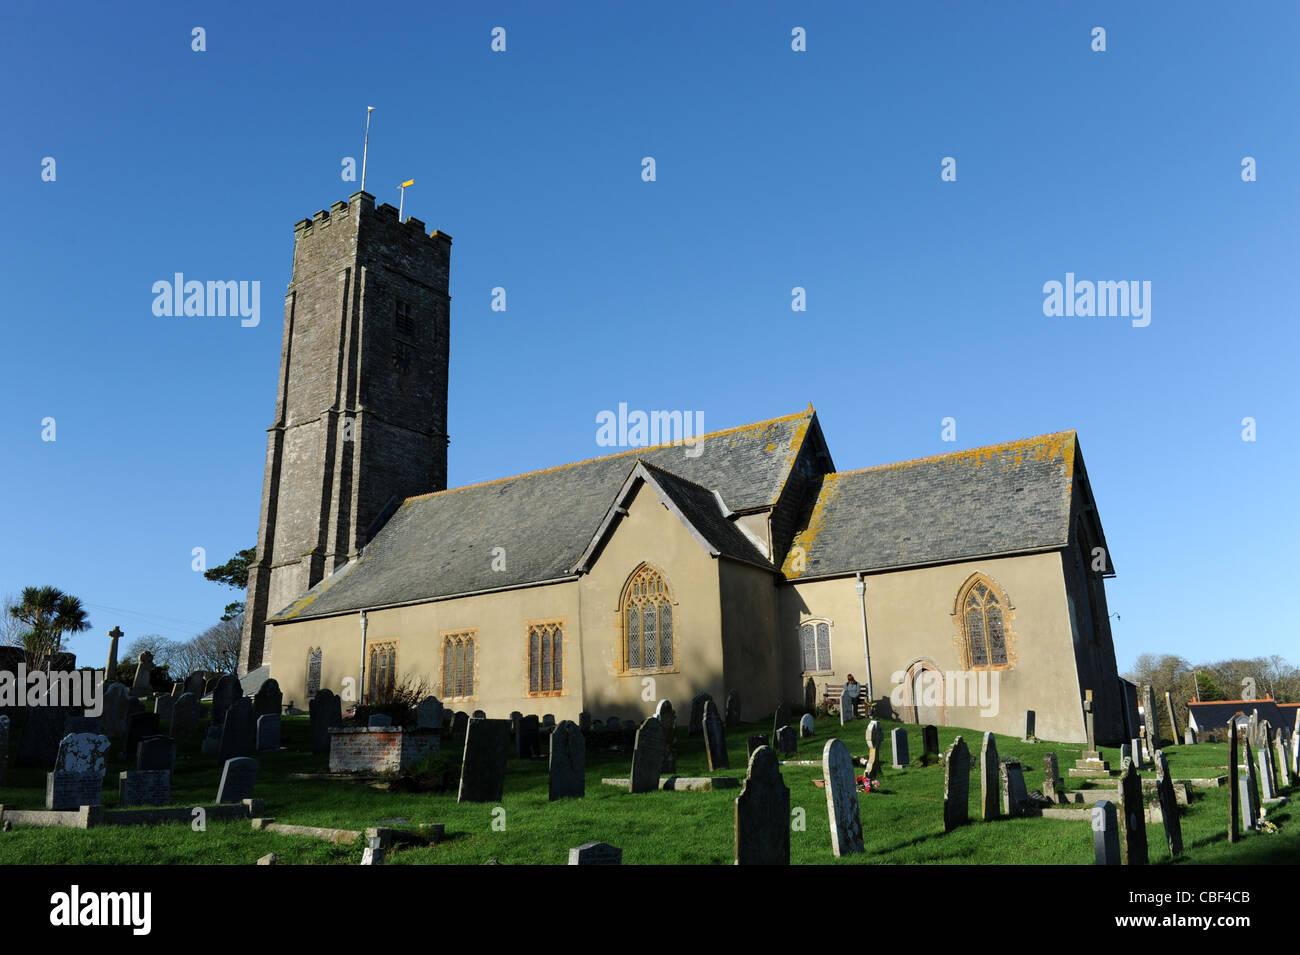 St Peter's Church Stoke Fleming South Hams Devon - Stock Image